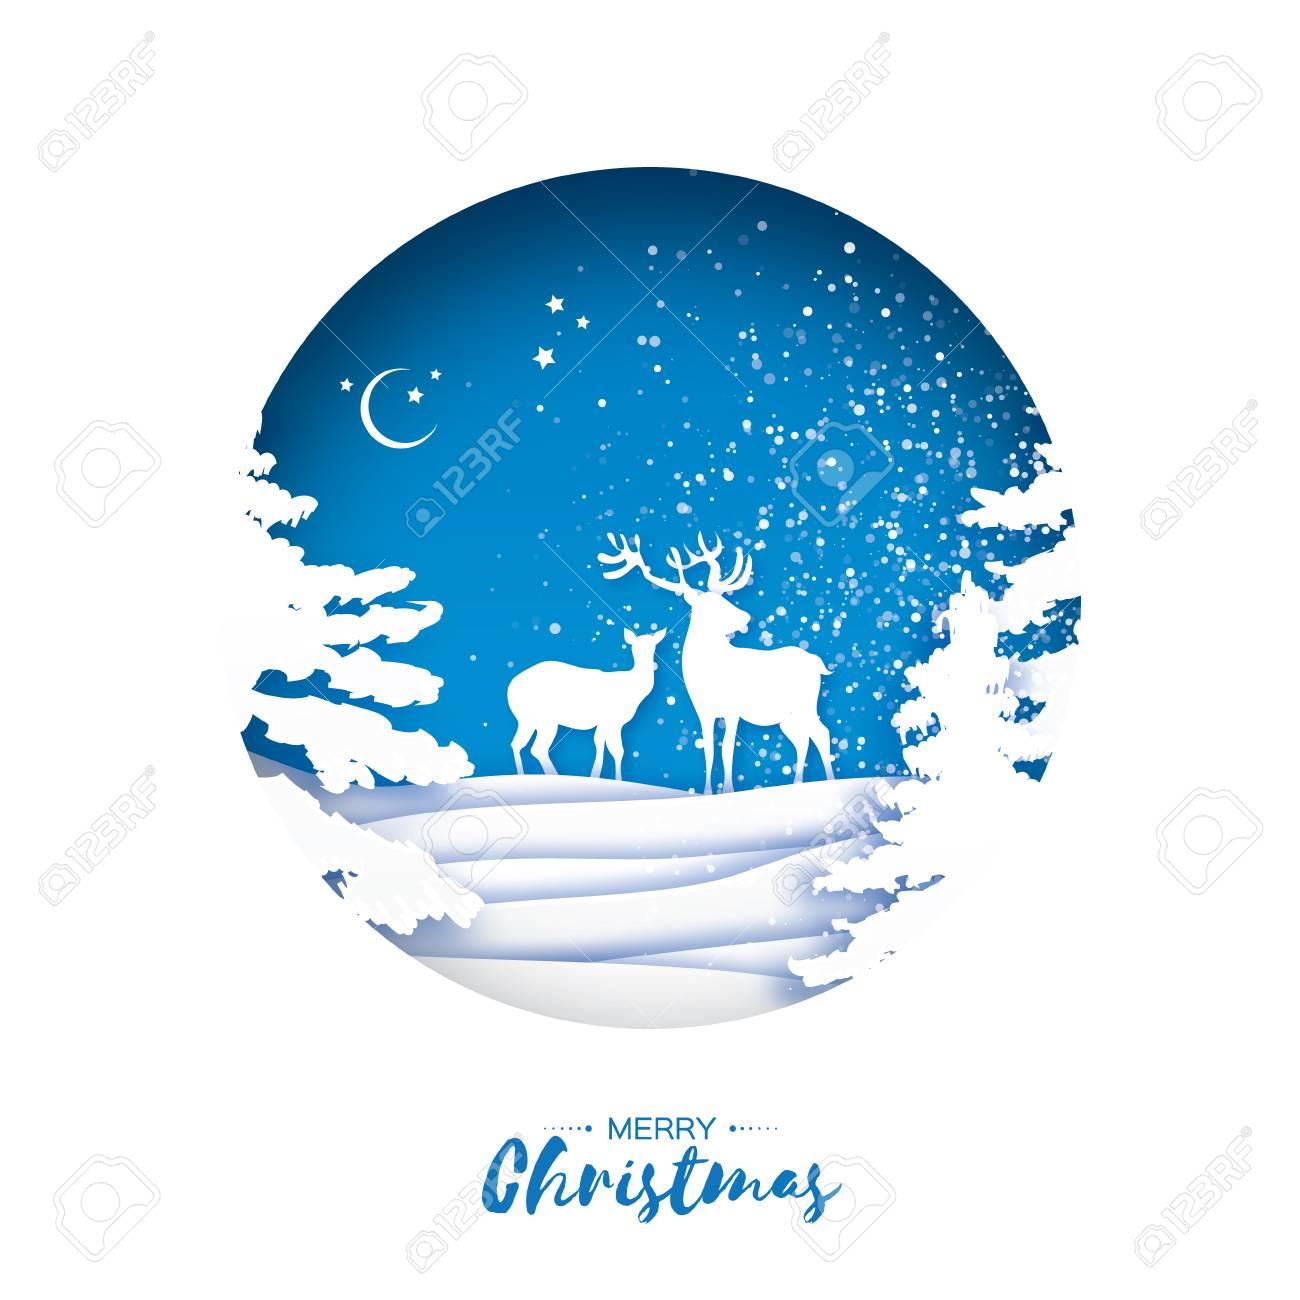 Merry christmas greeting card in paper cut style snow winter merry christmas greeting card in paper cut style snow winter forest landscape with deer m4hsunfo